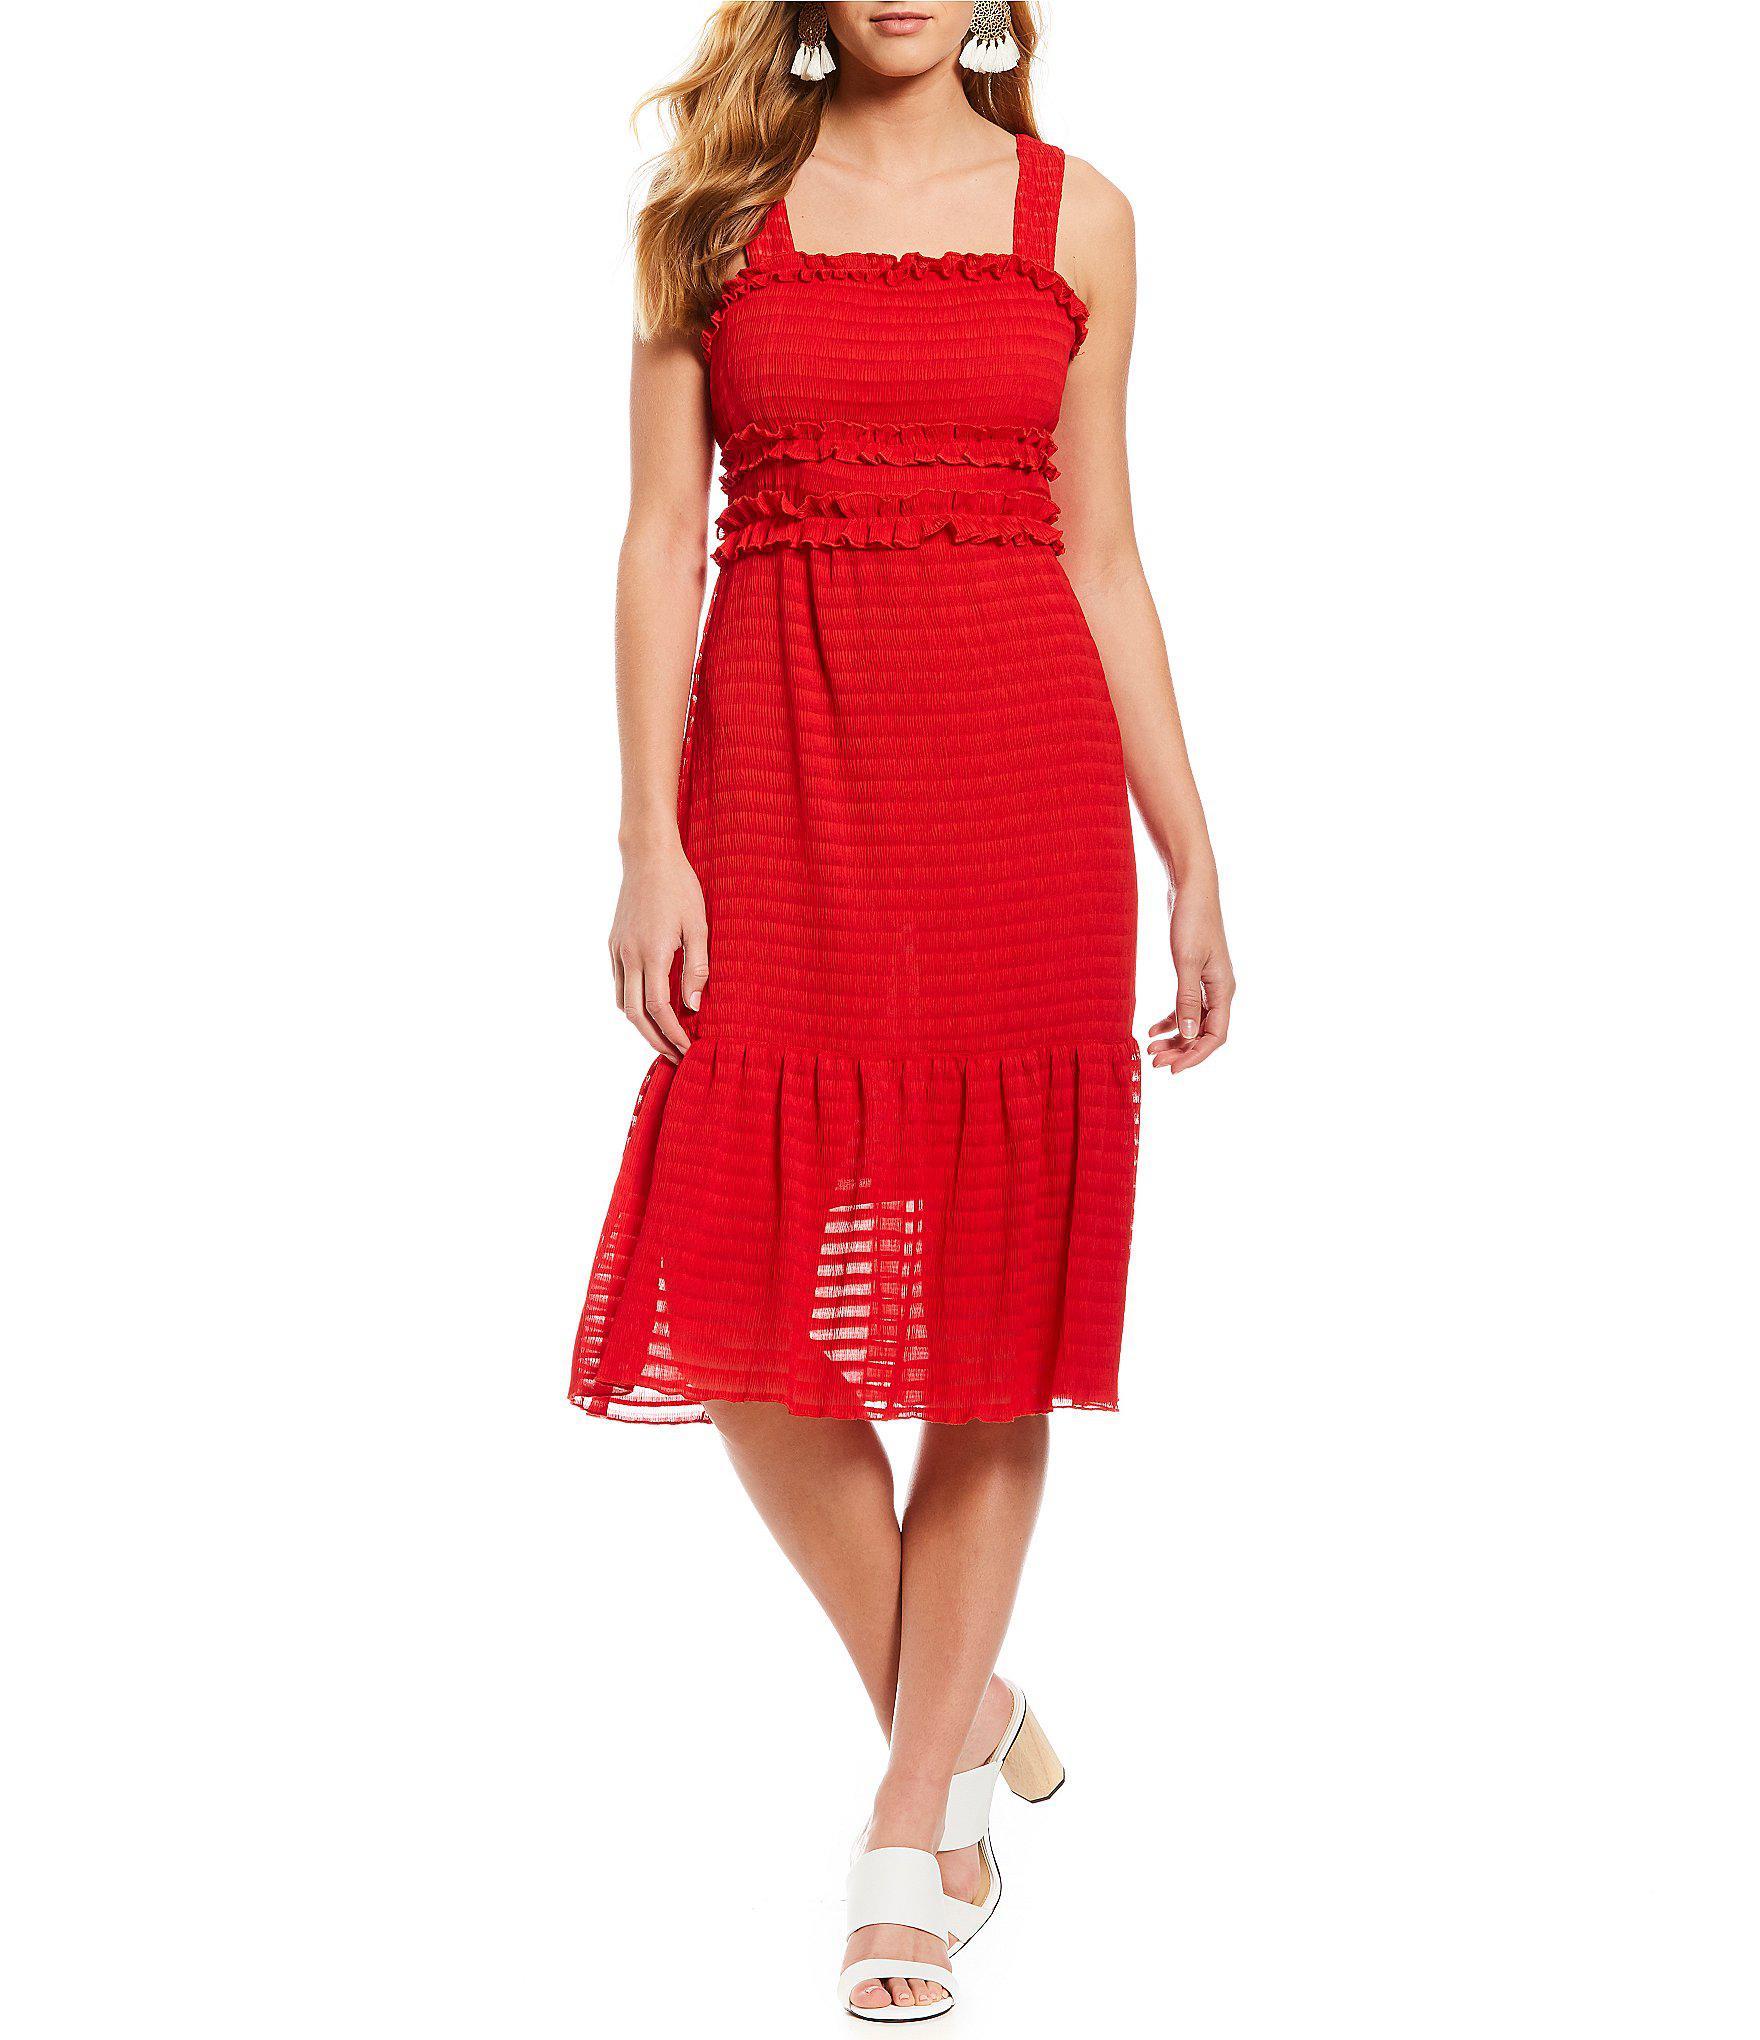 65eebb82af4 Gianni Bini Snyder Smocked Sheer Stripe Midi Dress in Red - Lyst